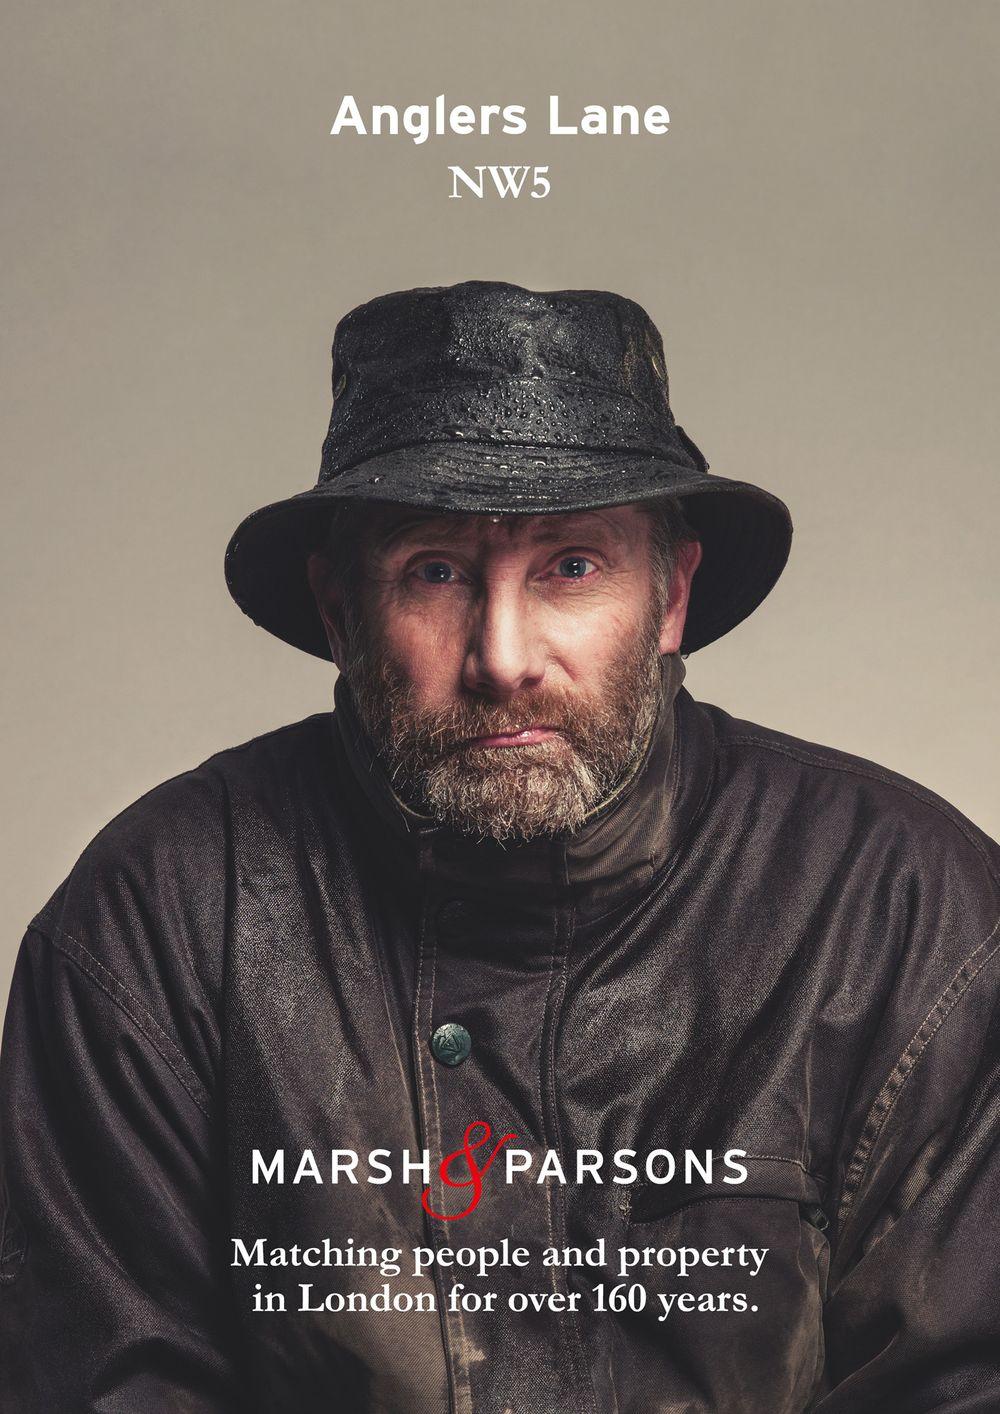 angler-marsh-parsons-photo-lorentz-gullachsen.jpg